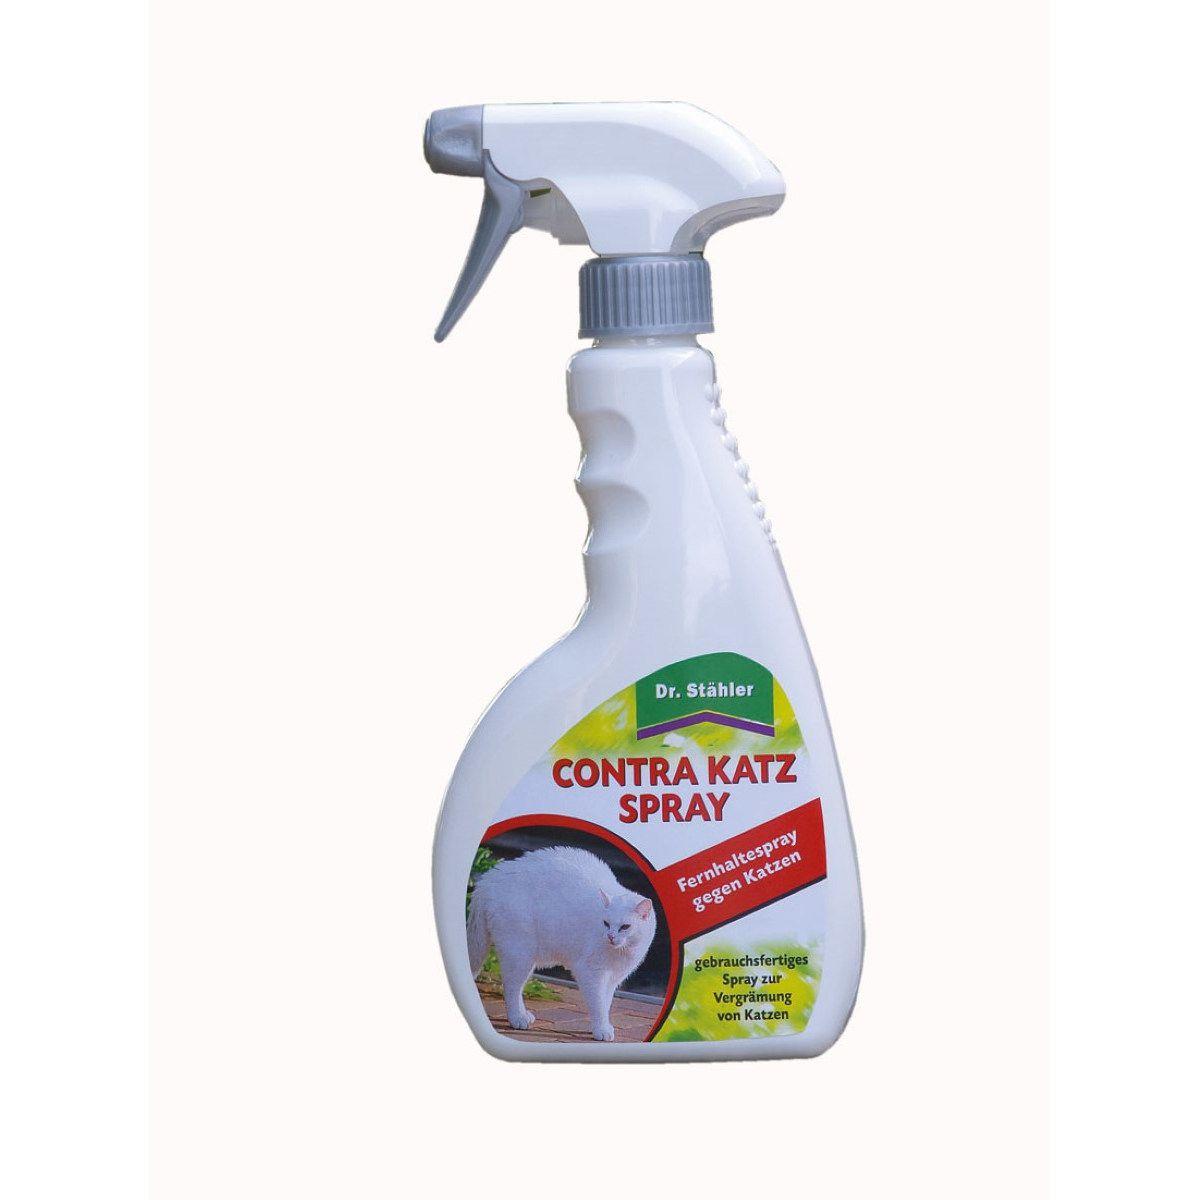 Dr. Stähler Contra Katz Spray 500 ml